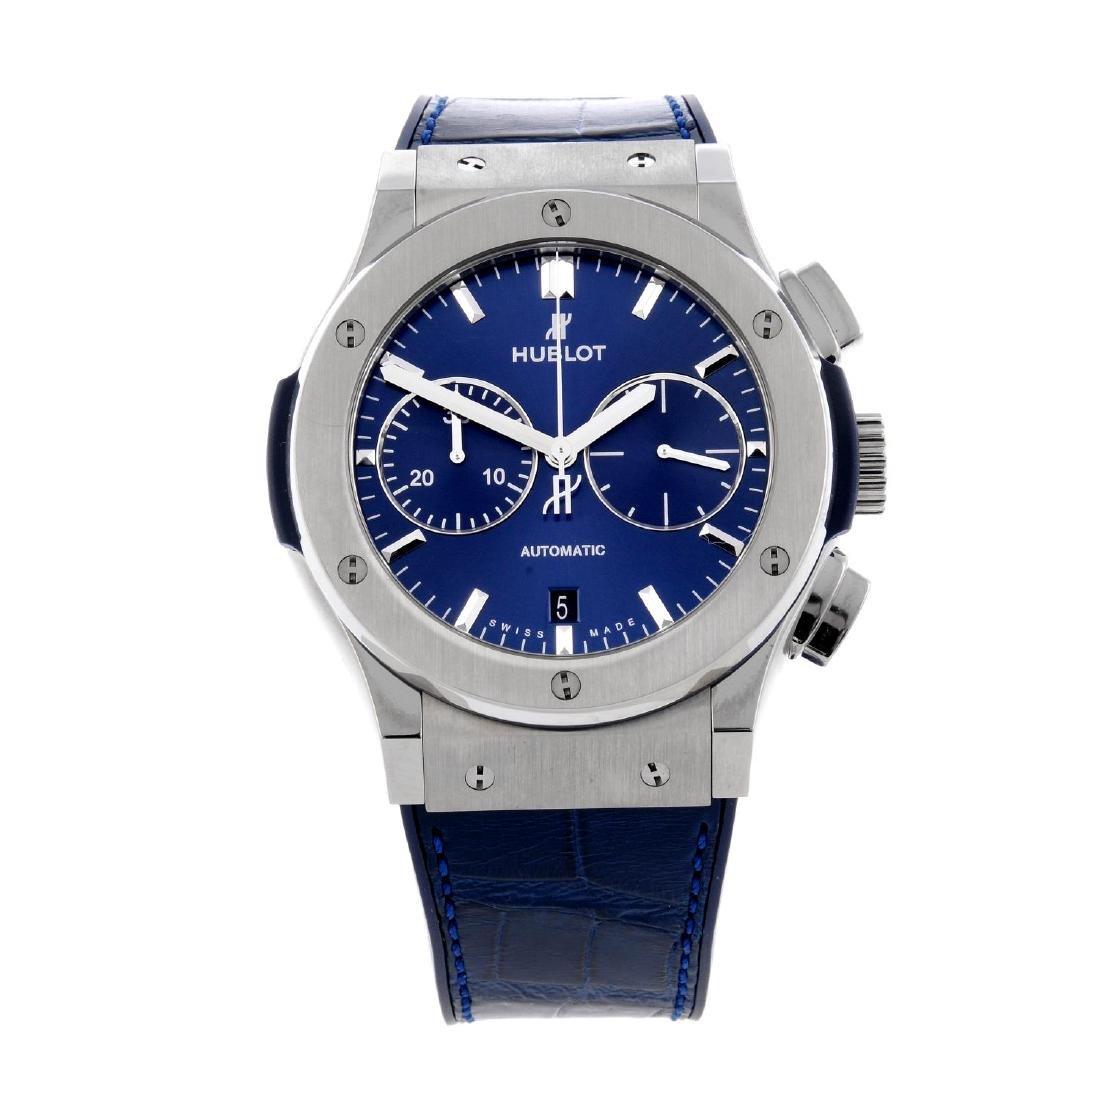 HUBLOT - a Classic Fusion chronograph wrist watch.